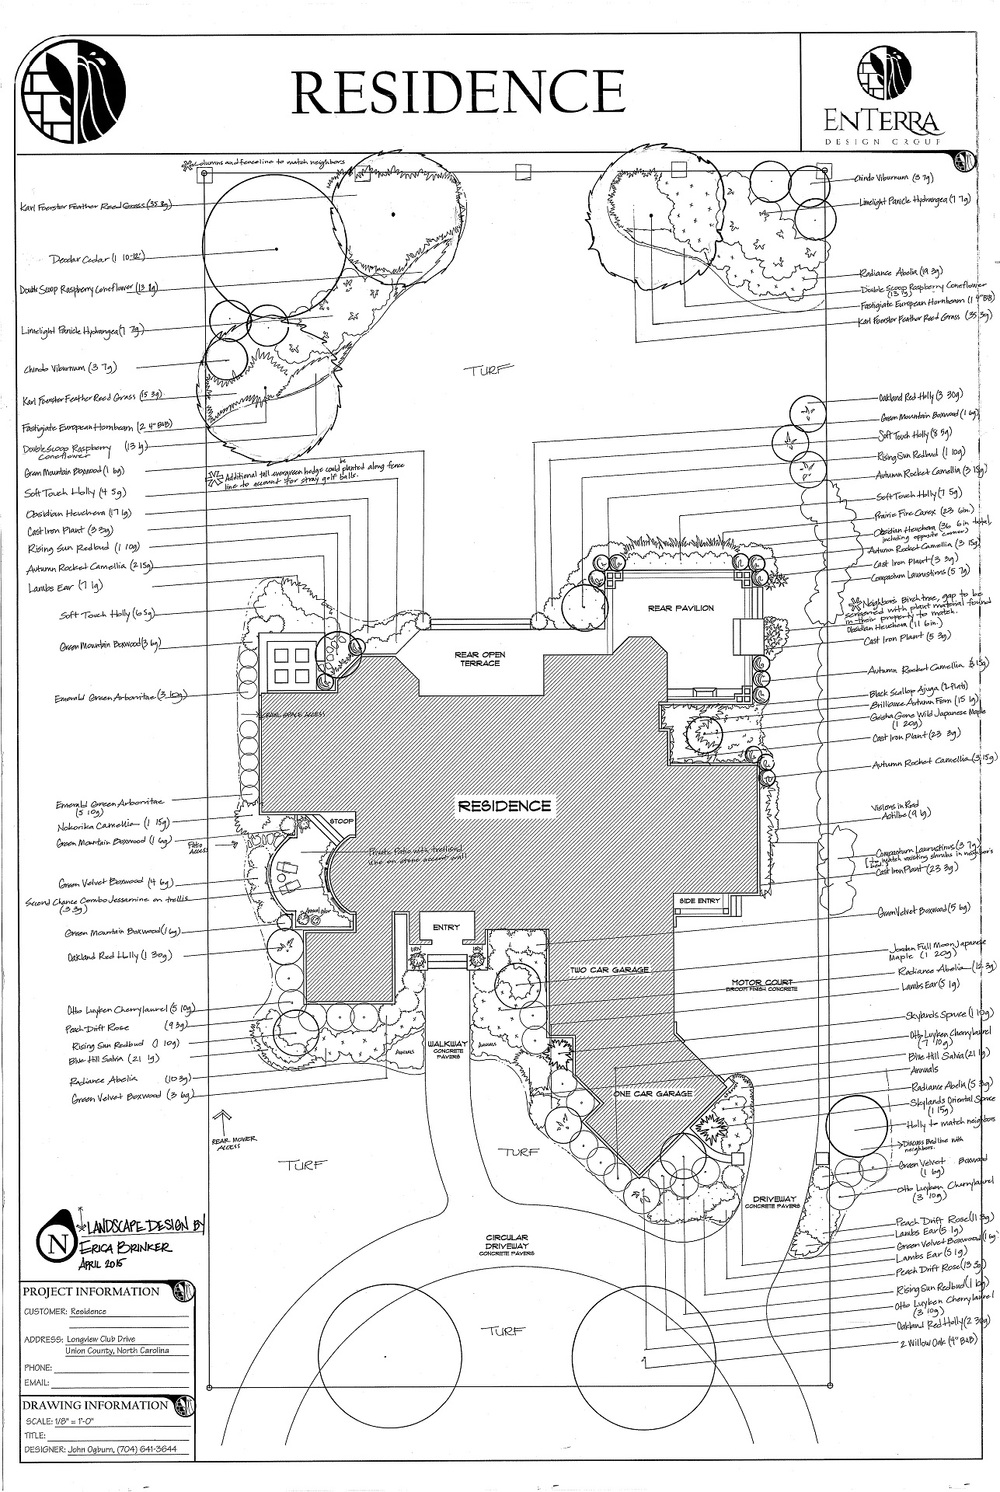 EnTerra Design - Landscape Plan